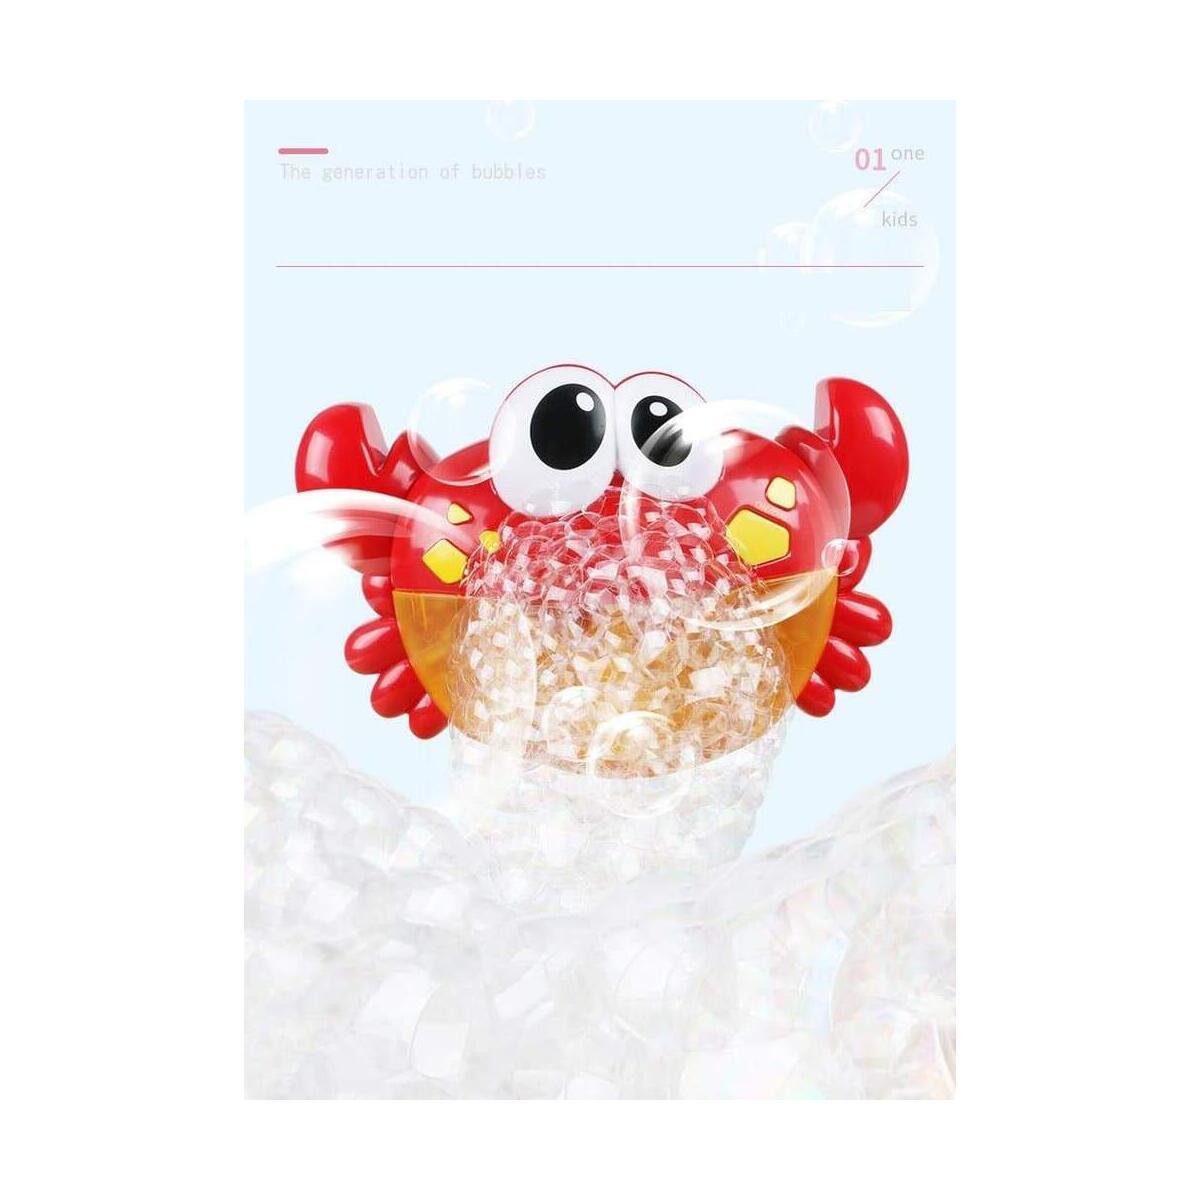 Bubble Machine Red Plastic Crab Automated Spout Music Machine Bubble Maker Baby Bath Shower Fun Toy